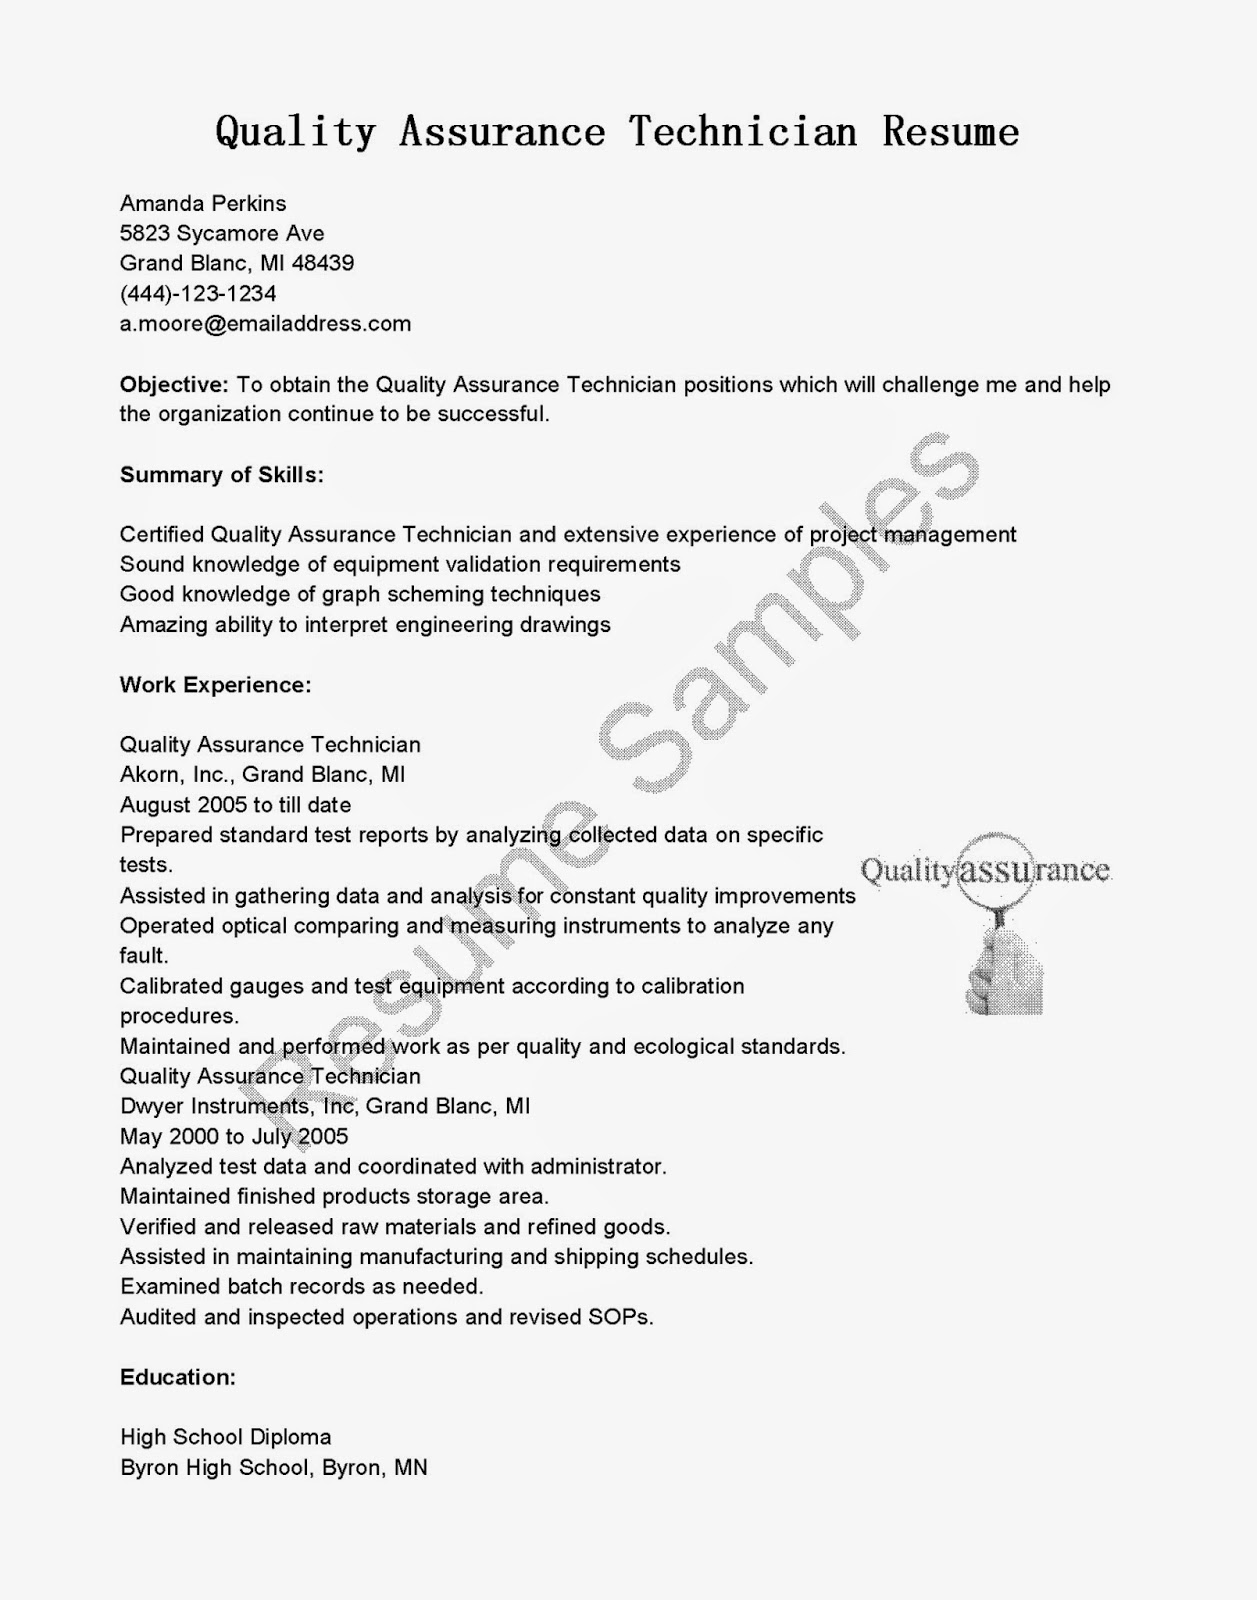 Behavioral Technician Resume Sample Doc Stimulating Certified Pharmacy Technician  Resume Brefash Stimulating Certified Pharmacy Technician Resume  Engineering Technician Resume